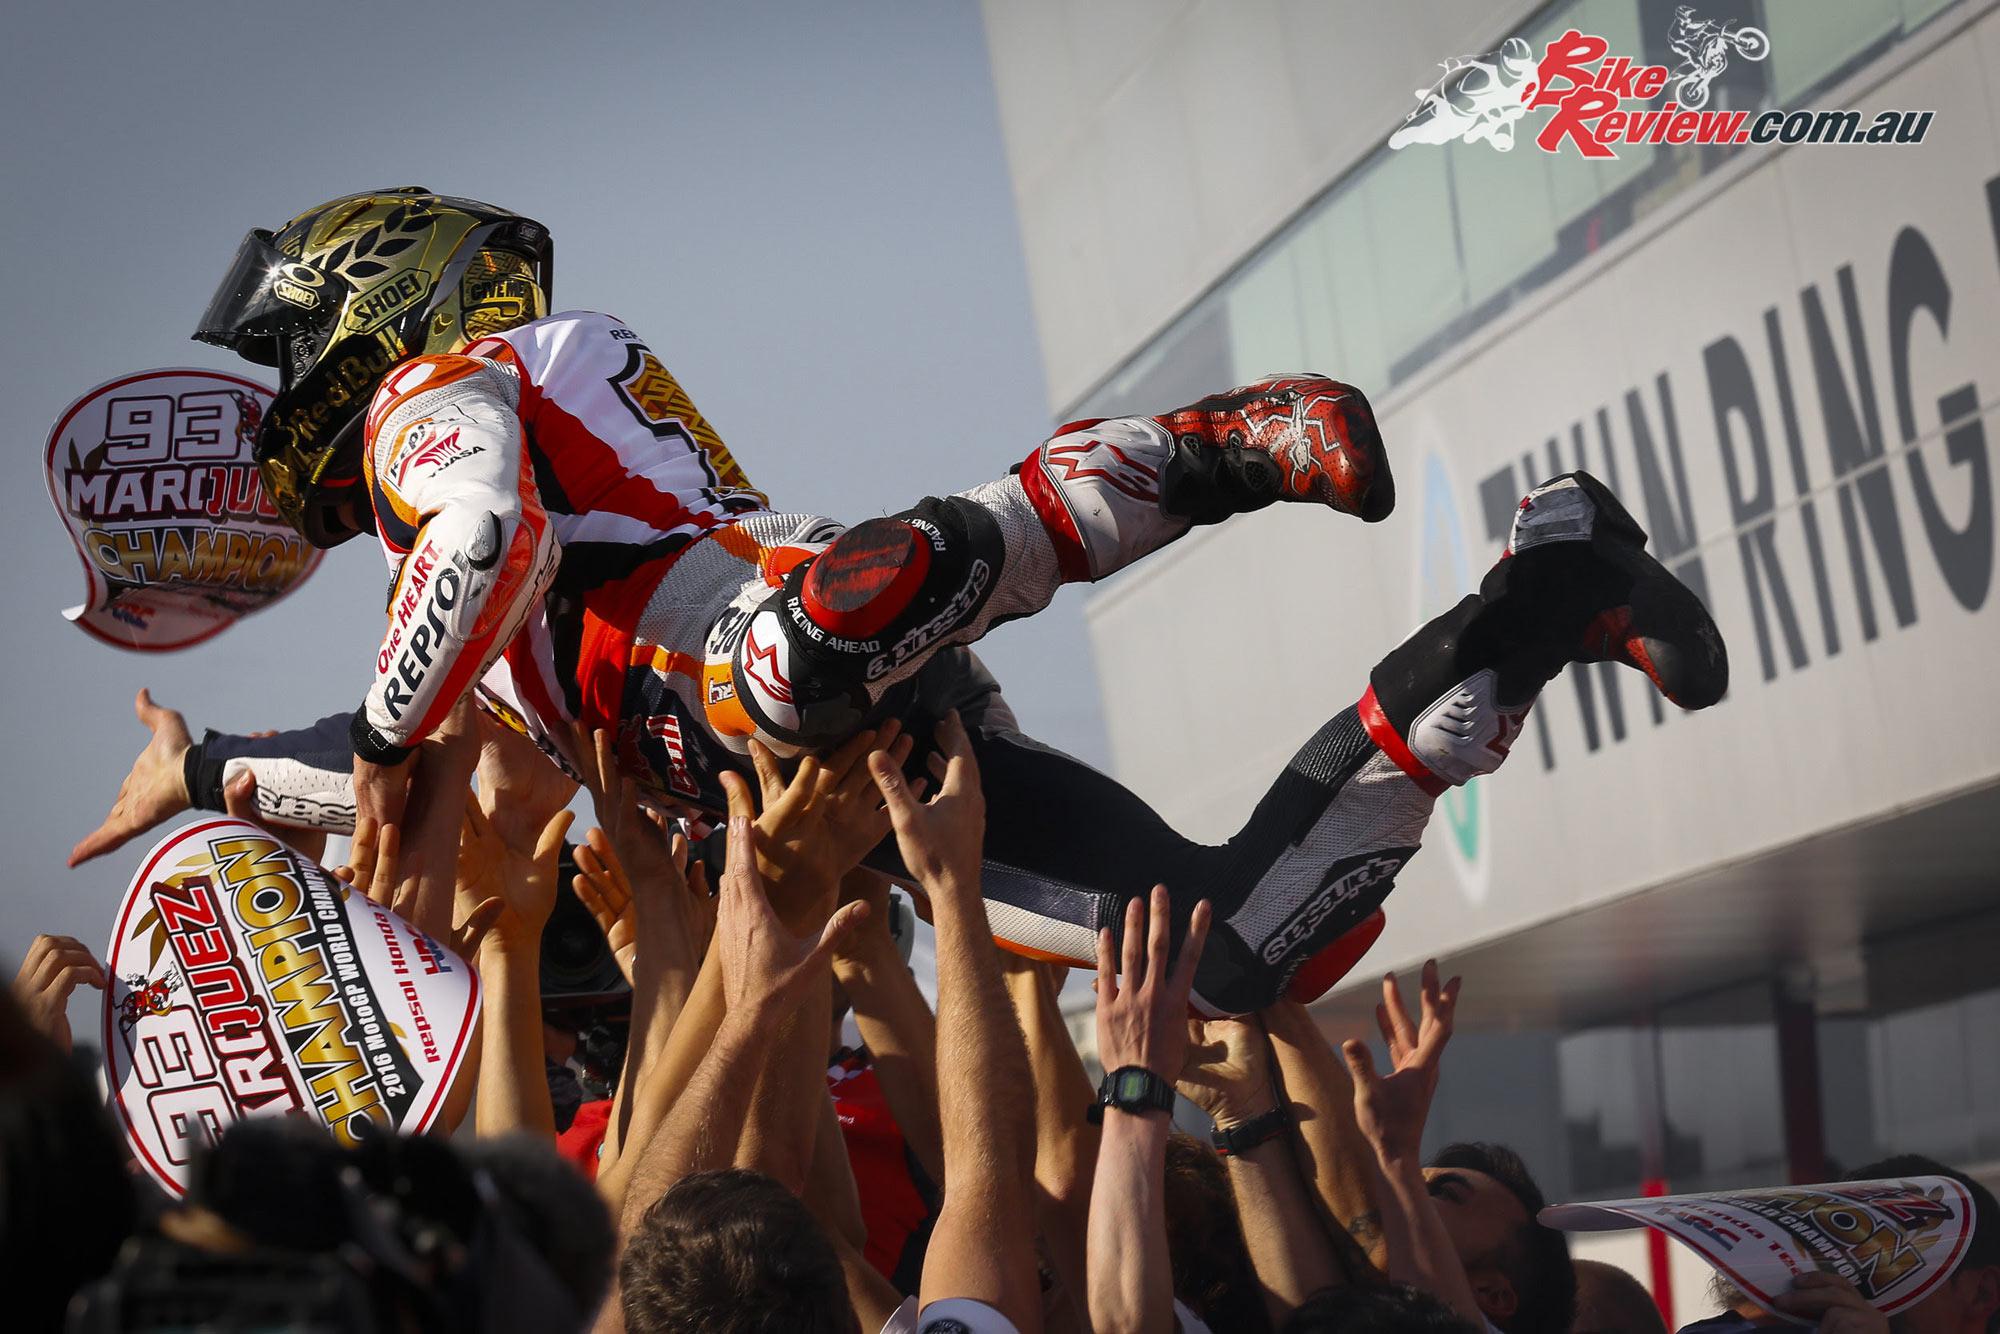 Marc Marquez Claims Third MotoGP World Championship - Bike Review